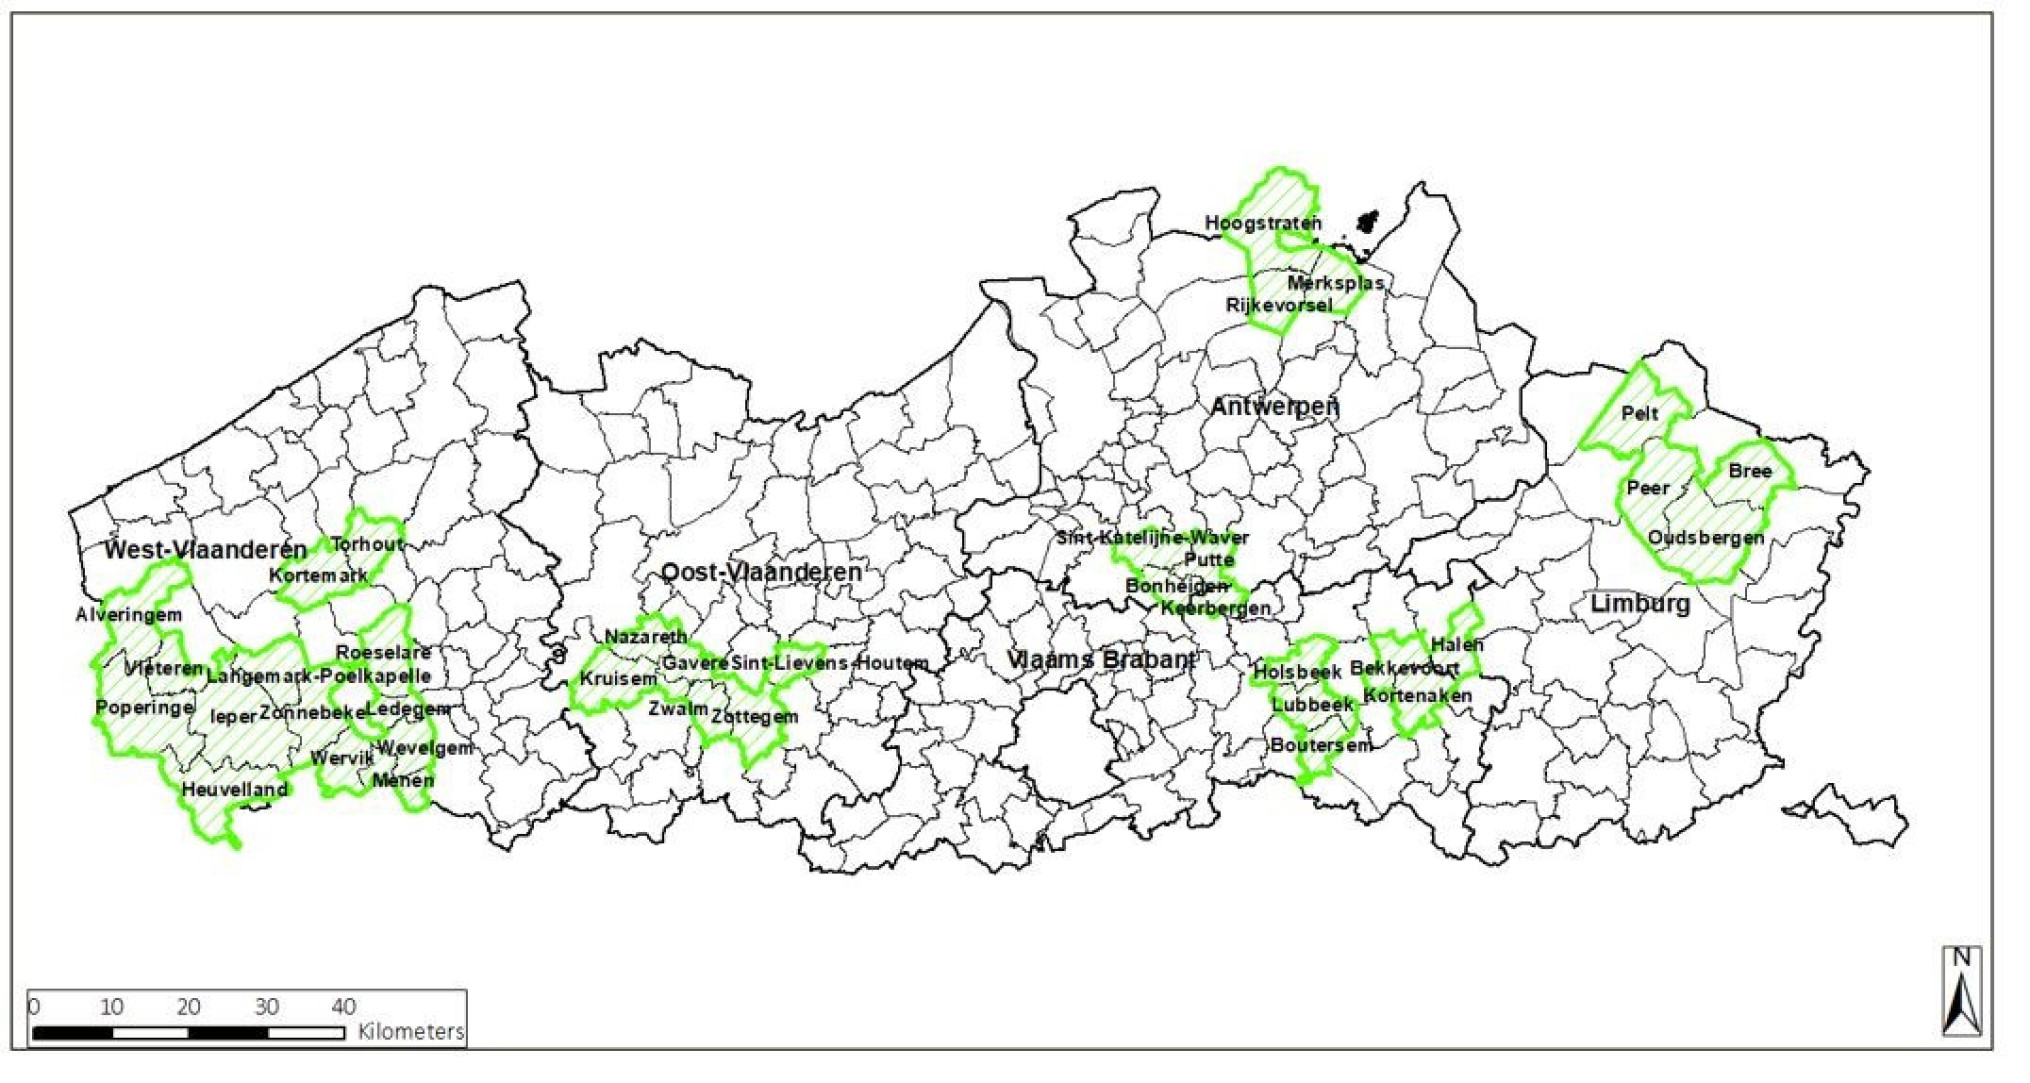 VLM-mestcontrole-VODKA+2021-2023